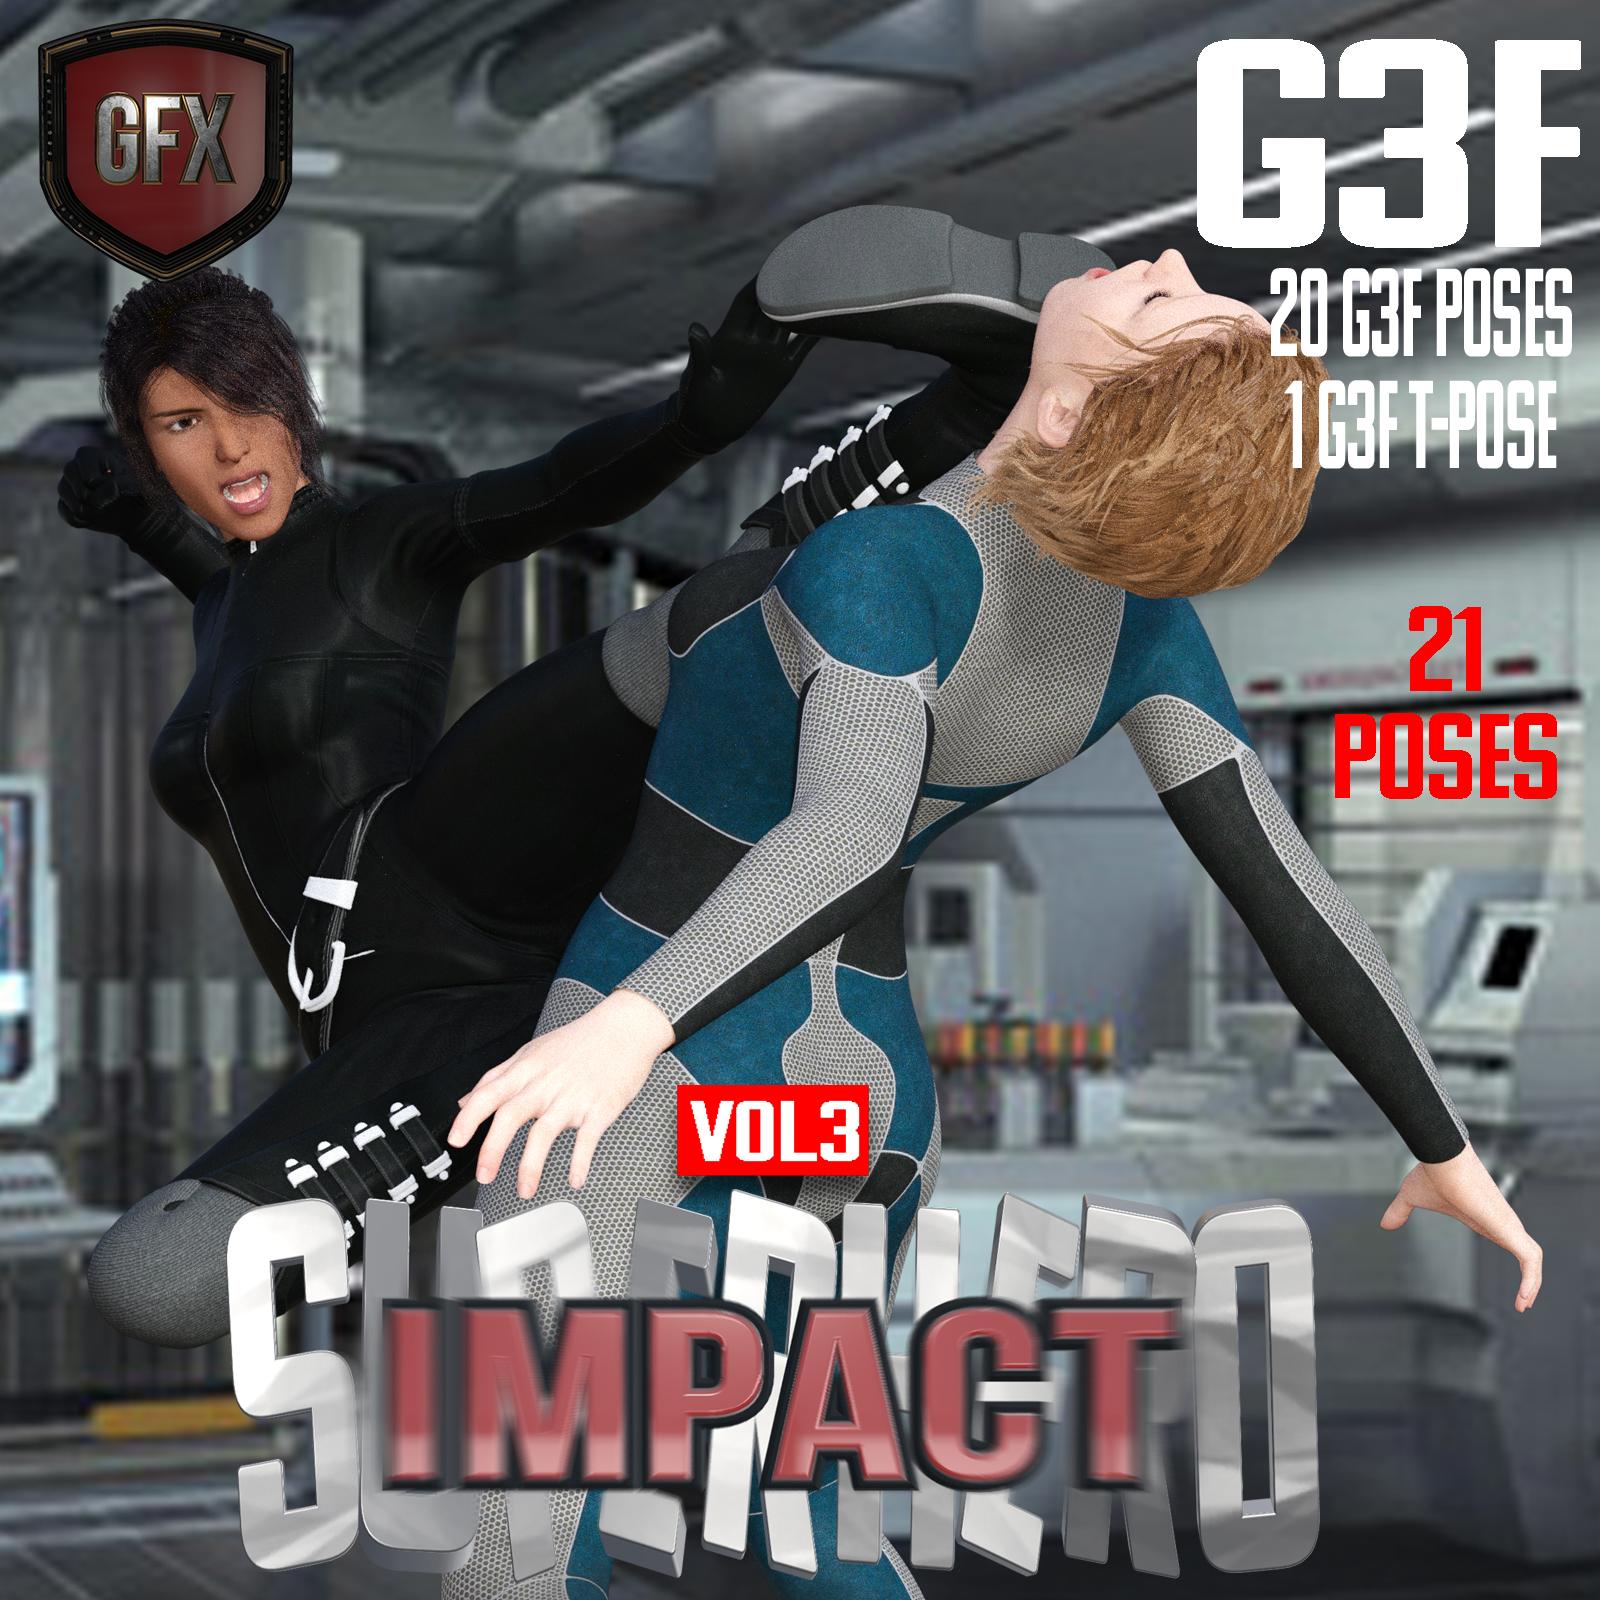 SuperHero Impact for G3F Volume 3